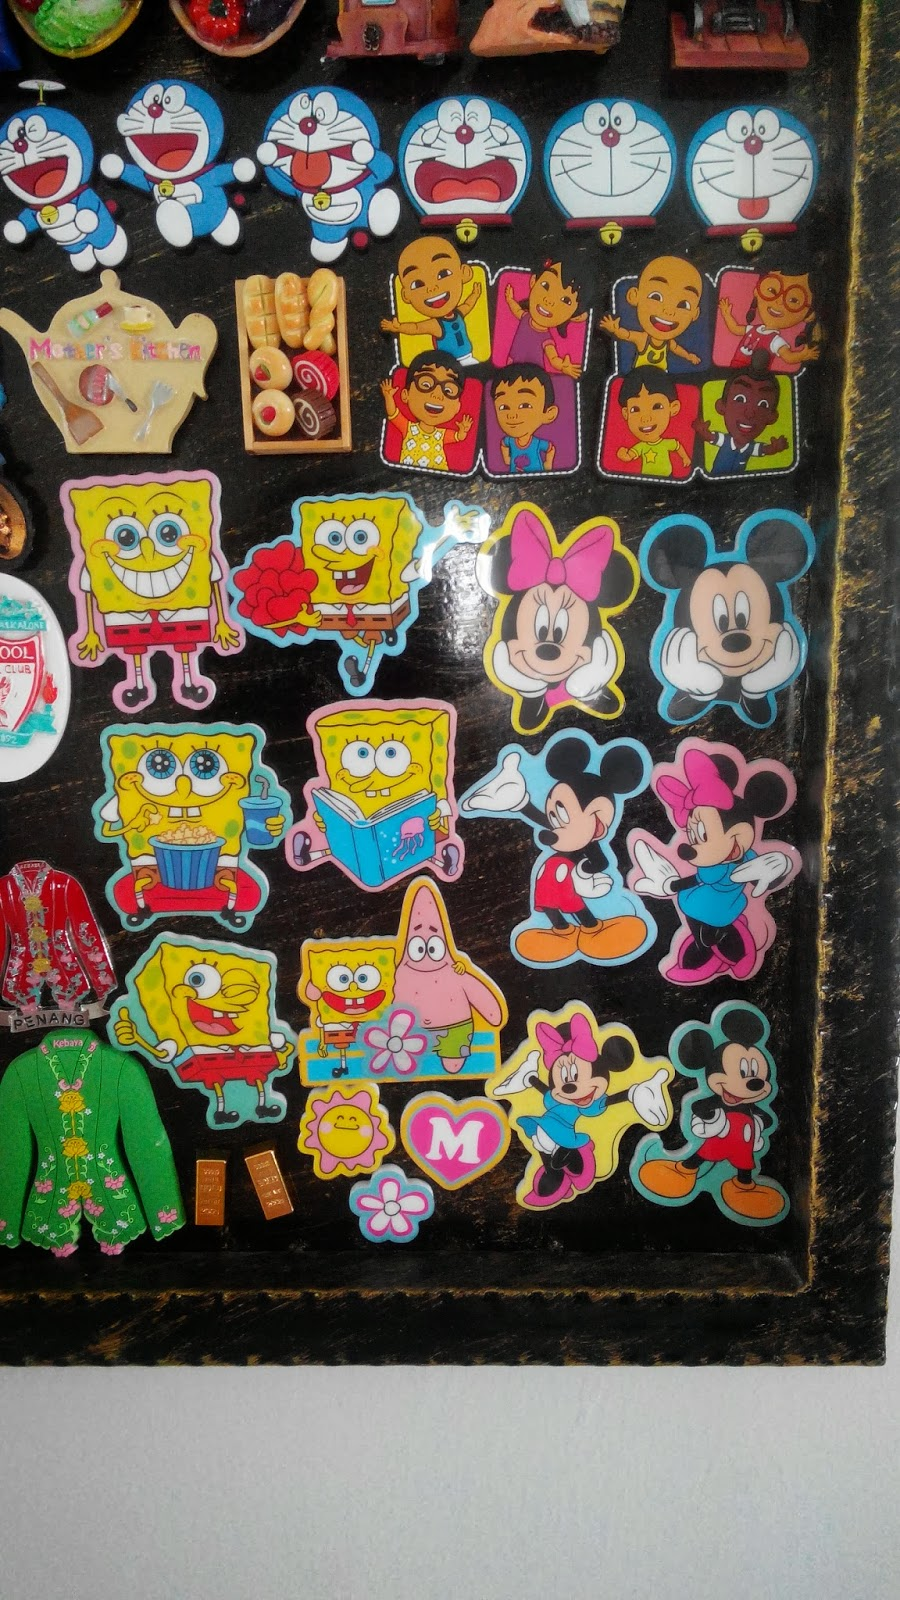 koleksi fm watak kartun